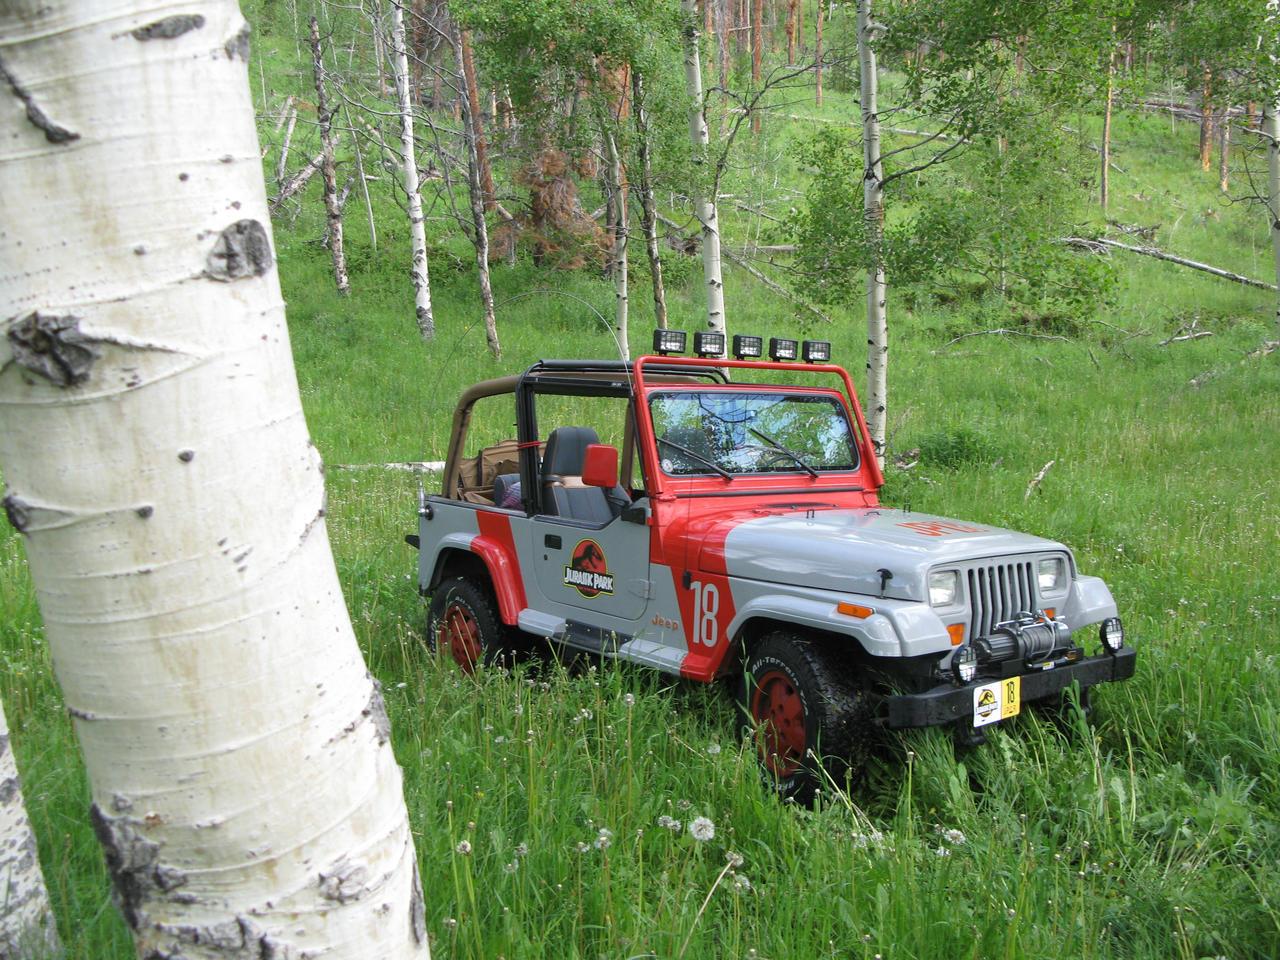 Jurassic Park Jeep Wrangler 41 by Boomerjinks